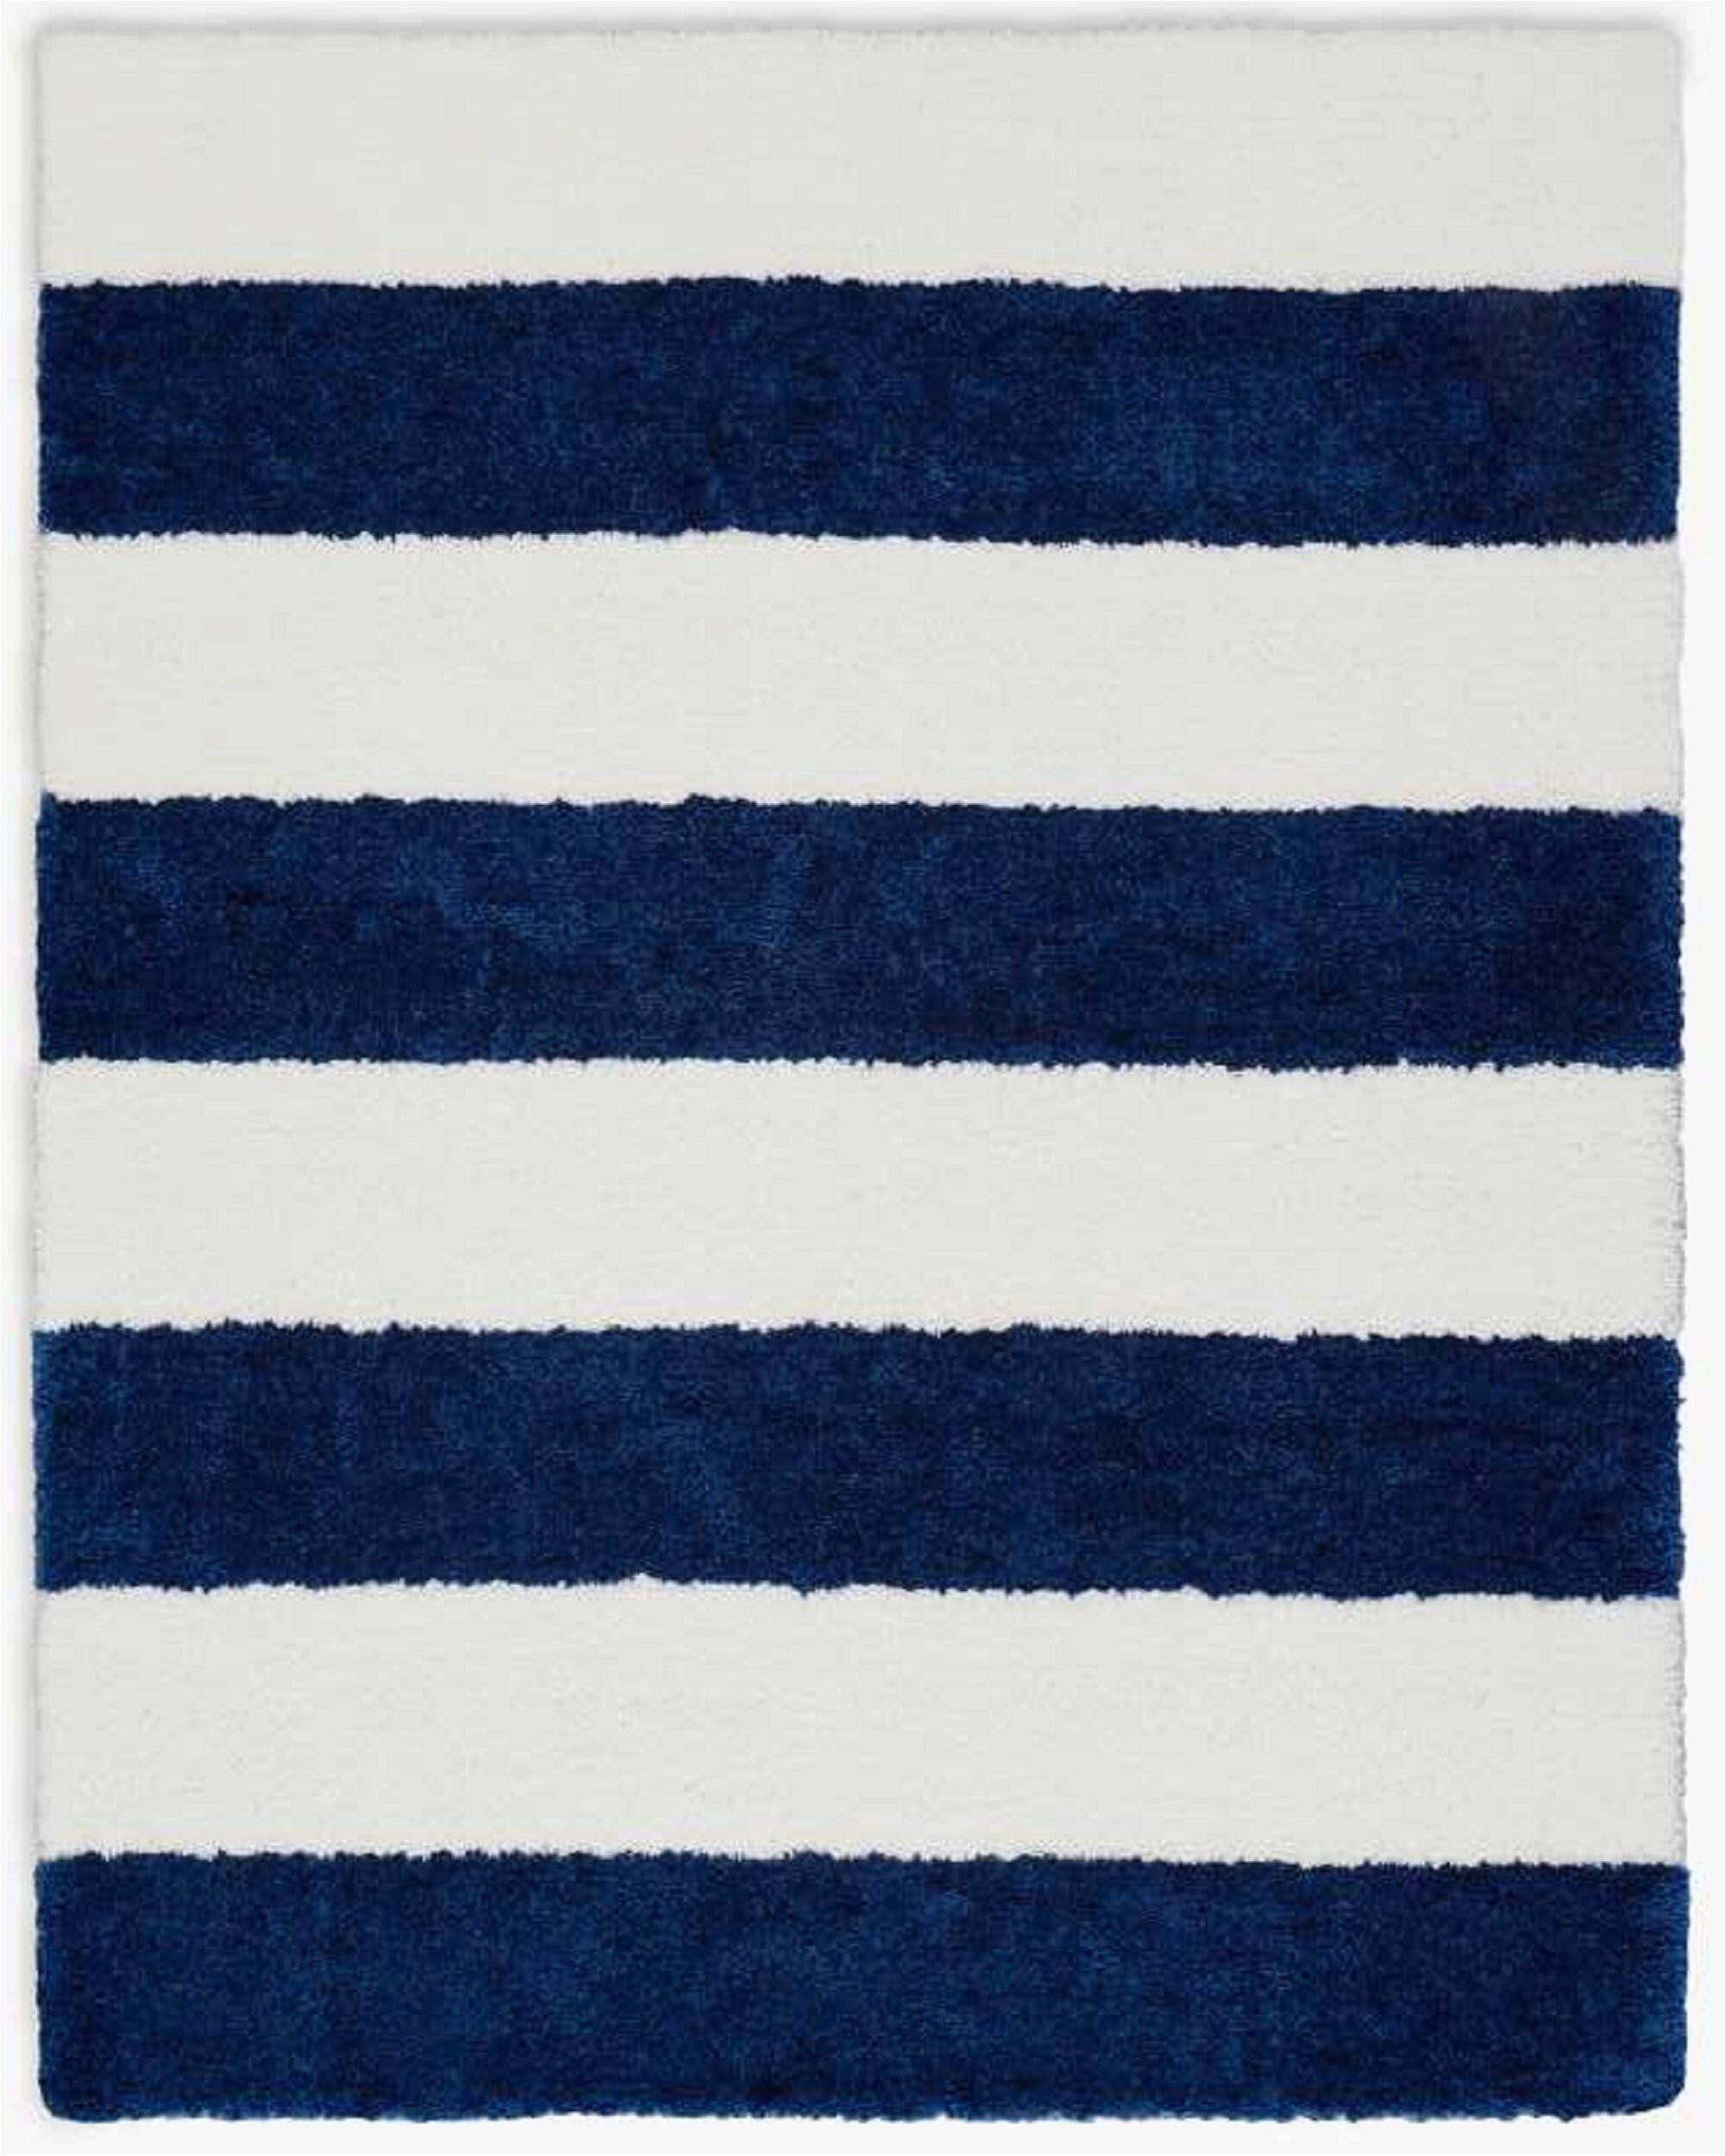 Navy Blue Striped area Rug Chicago Striped Handmade Shag White Navy Blue area Rug